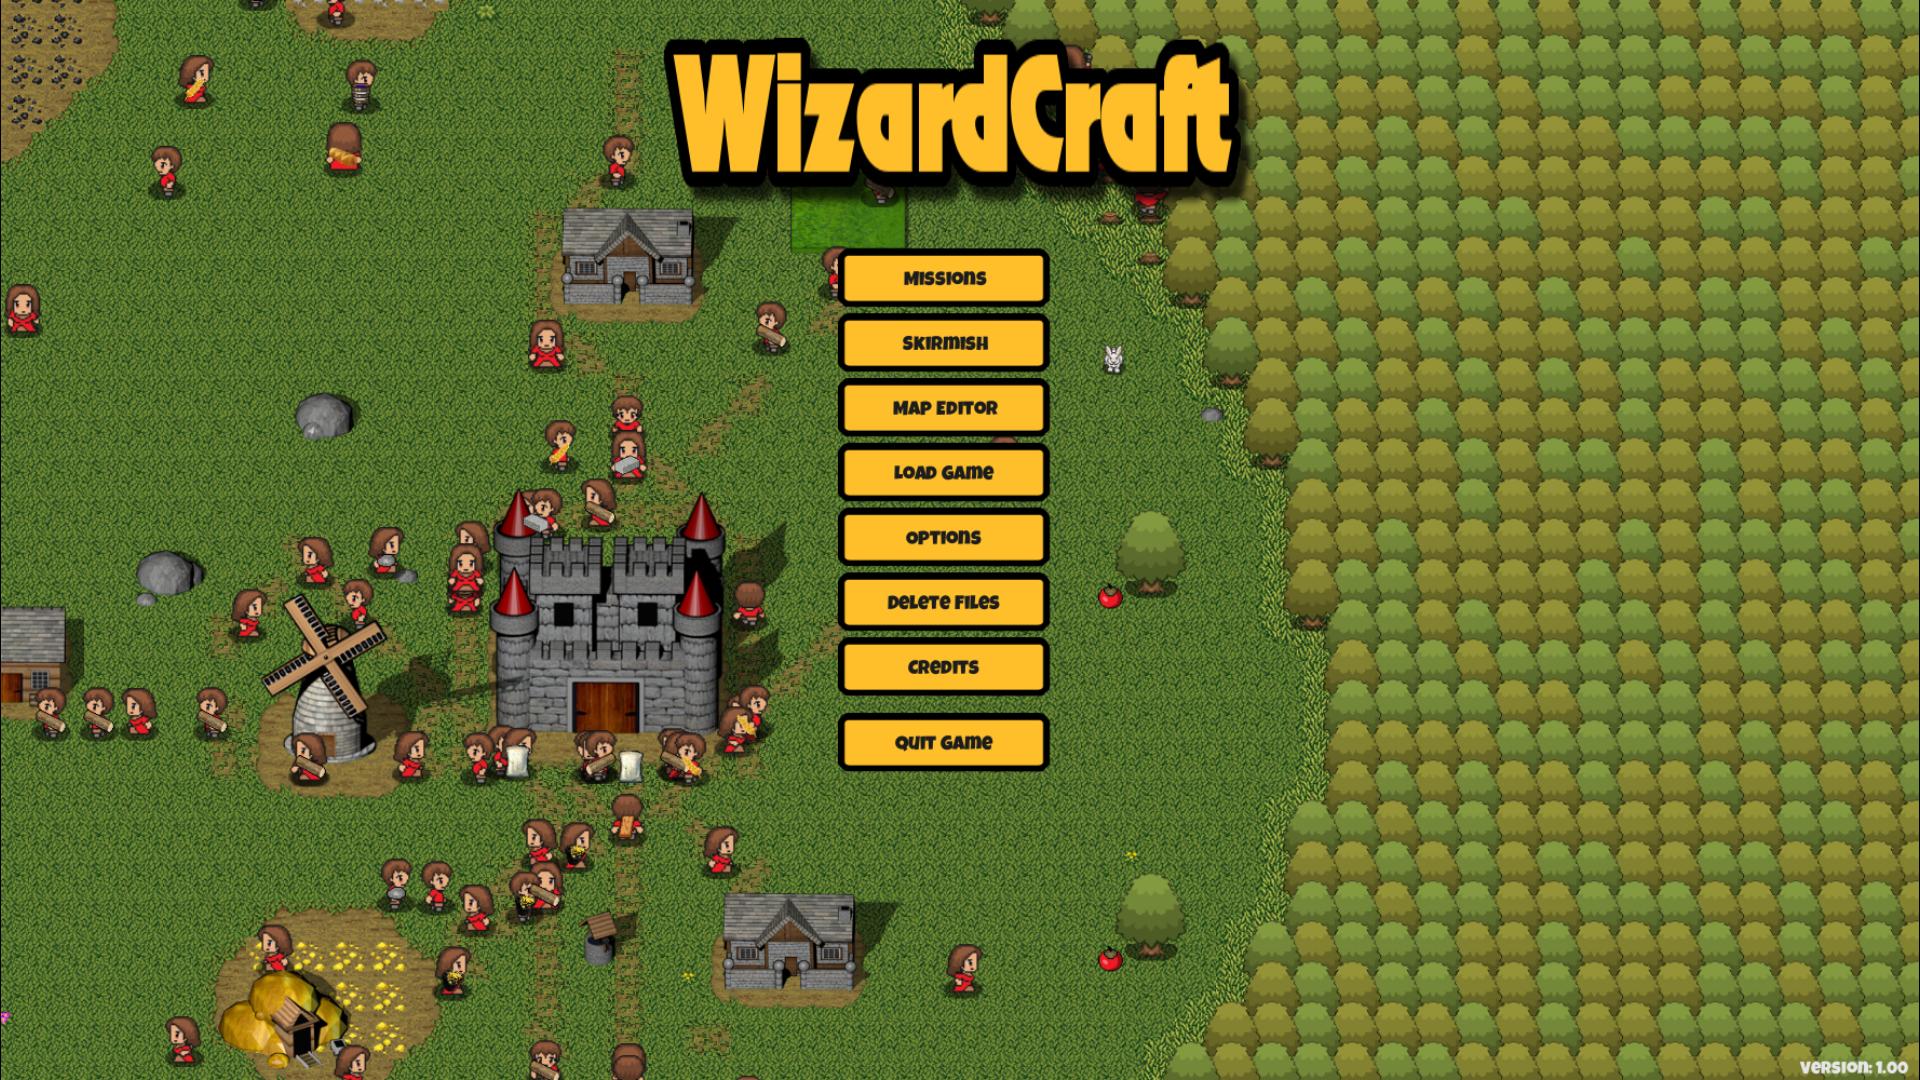 WizardCraft mainmenu